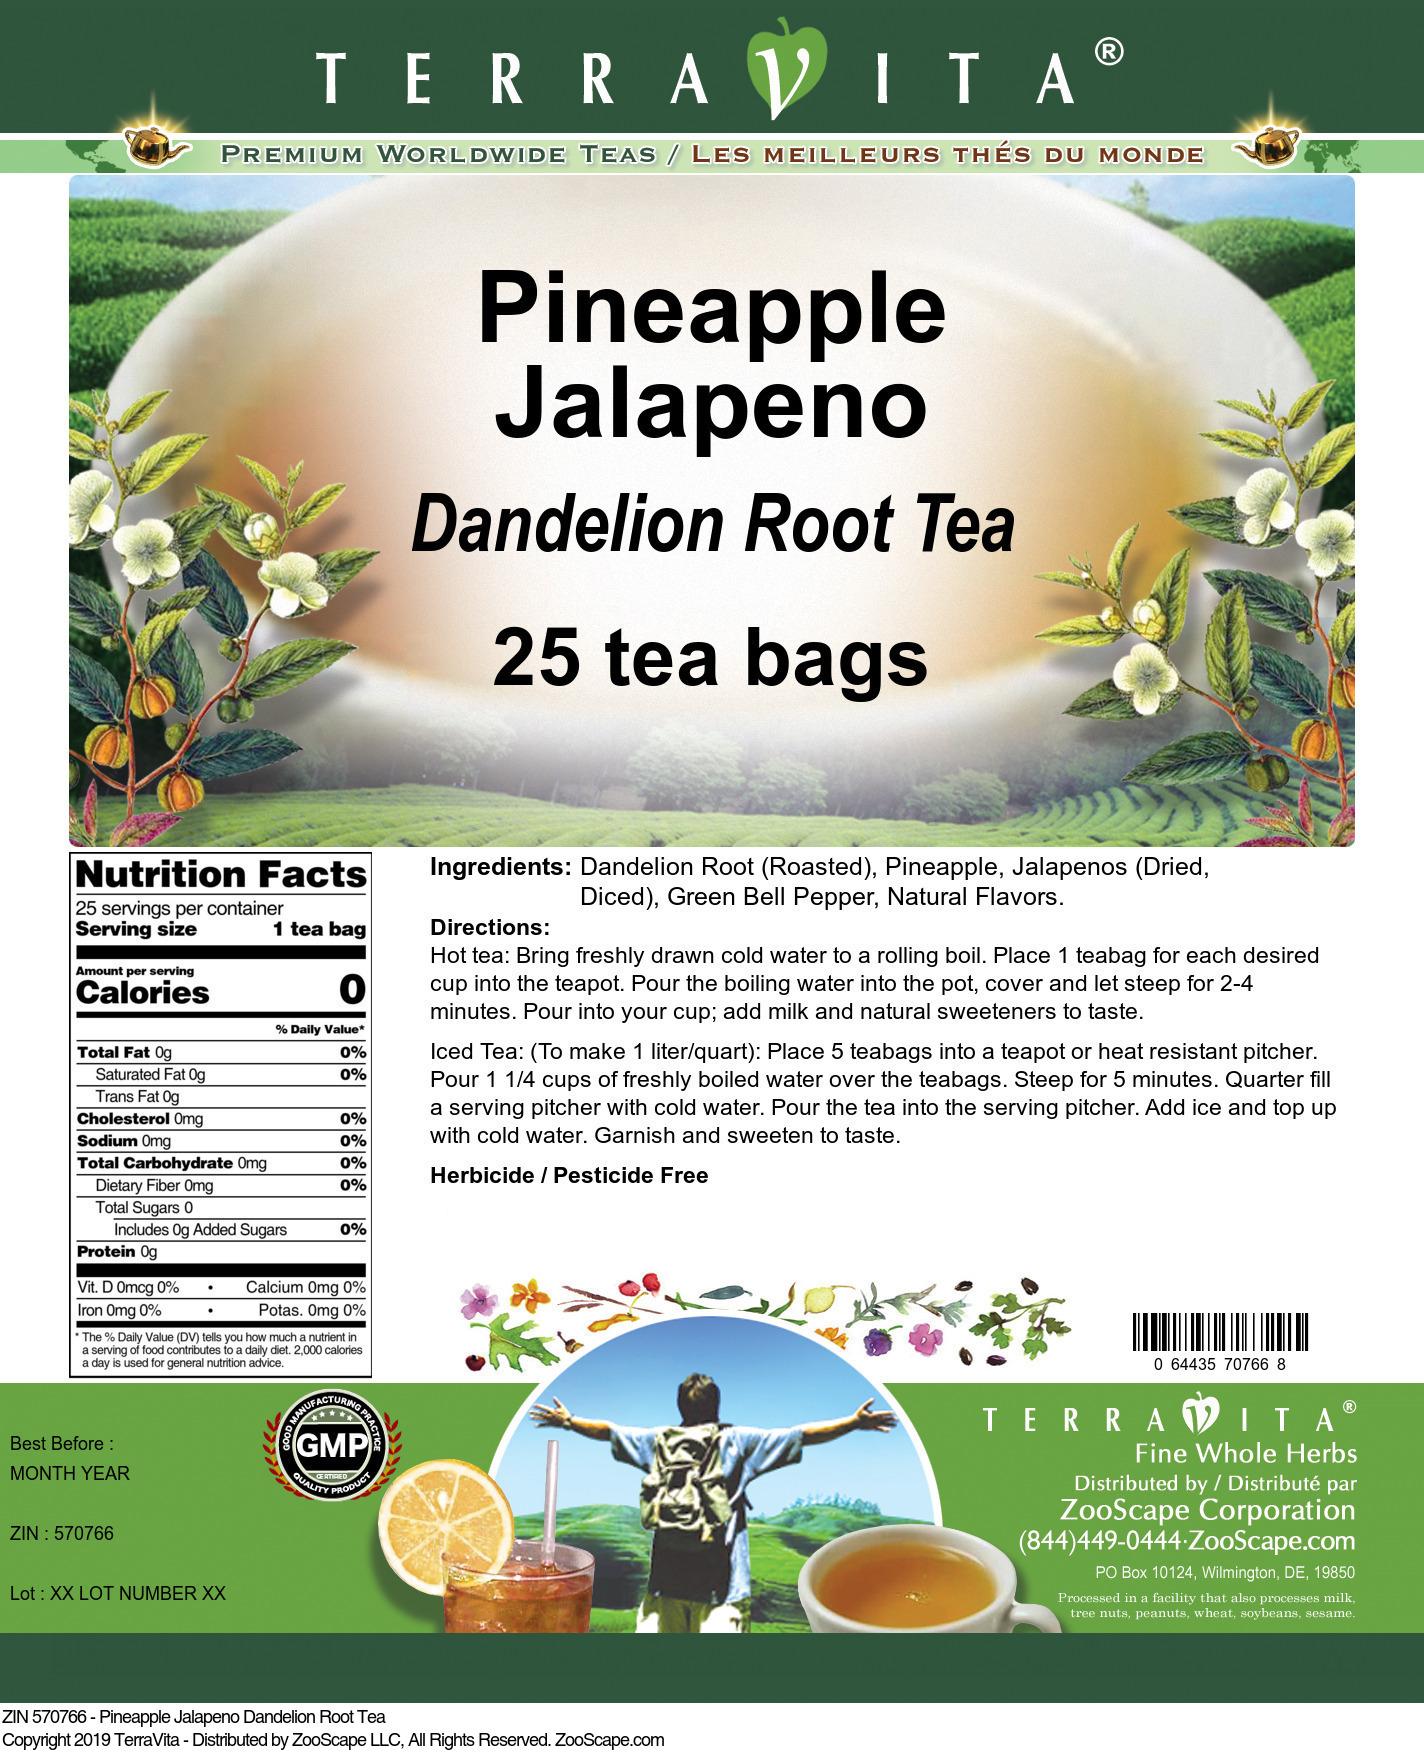 Pineapple Jalapeno Dandelion Root Tea